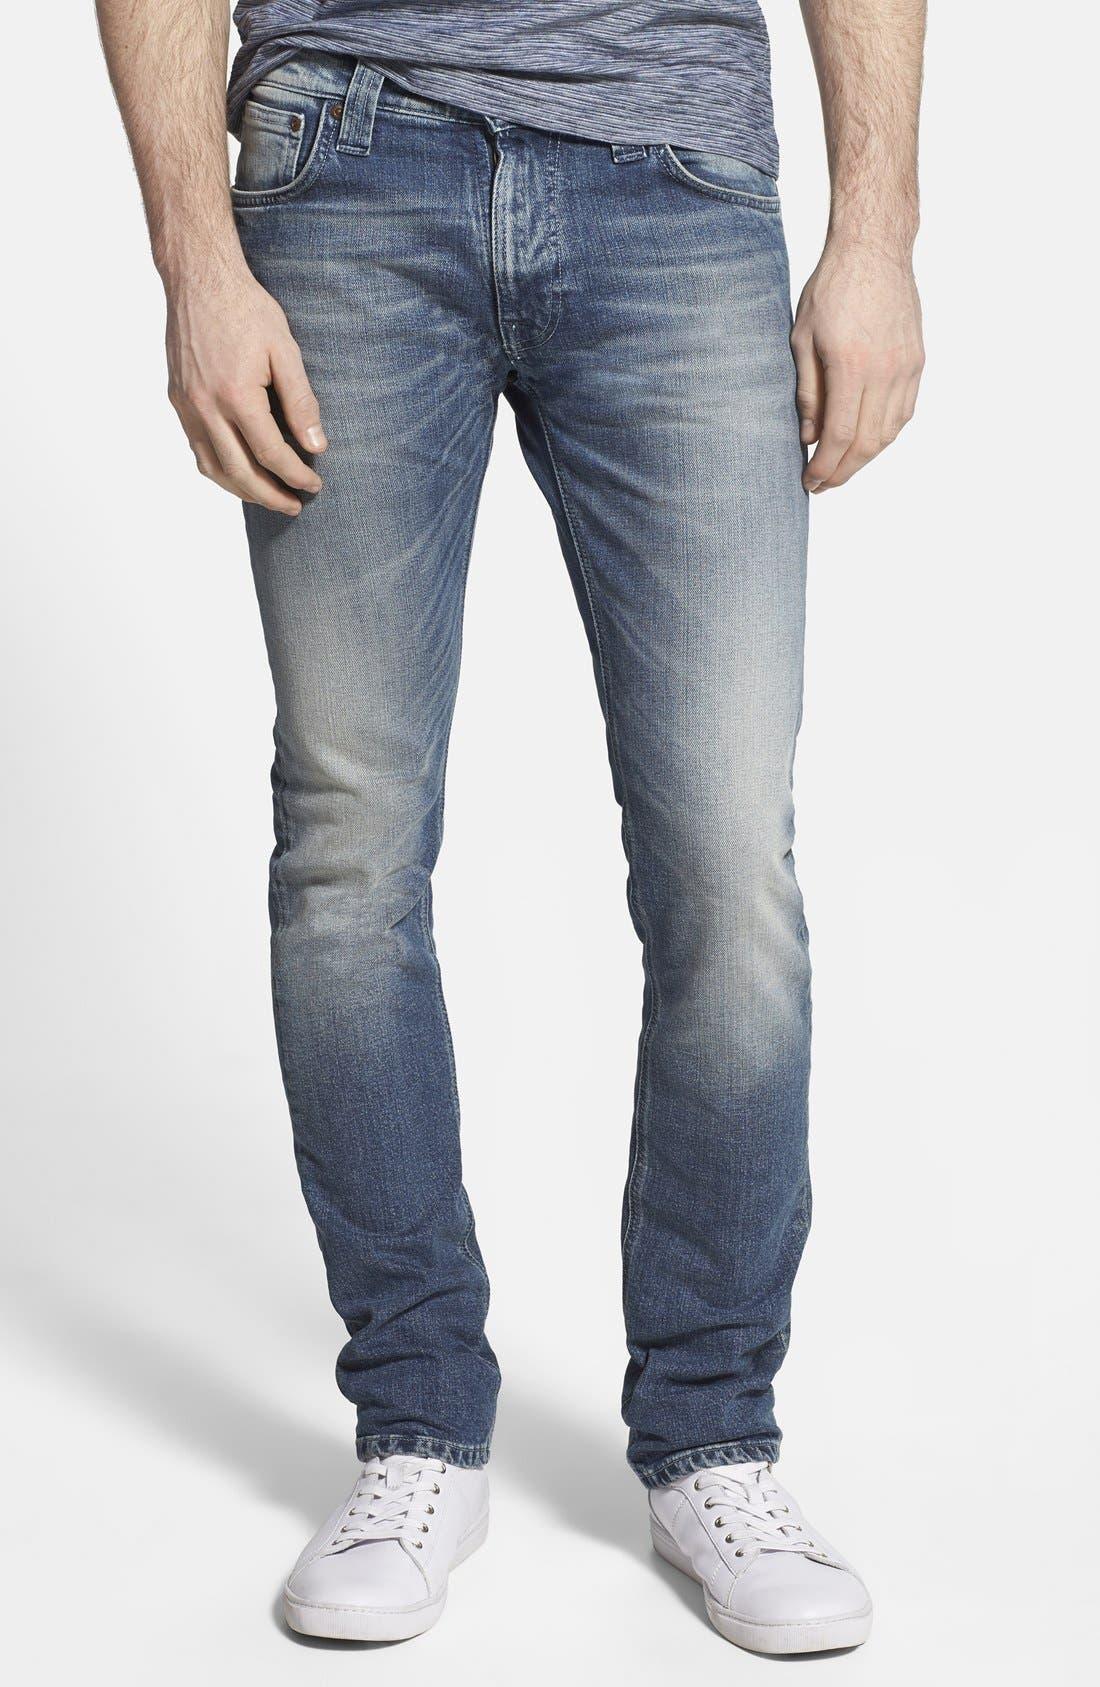 'Thin Finn' Skinny Fit Jeans,                             Main thumbnail 1, color,                             401